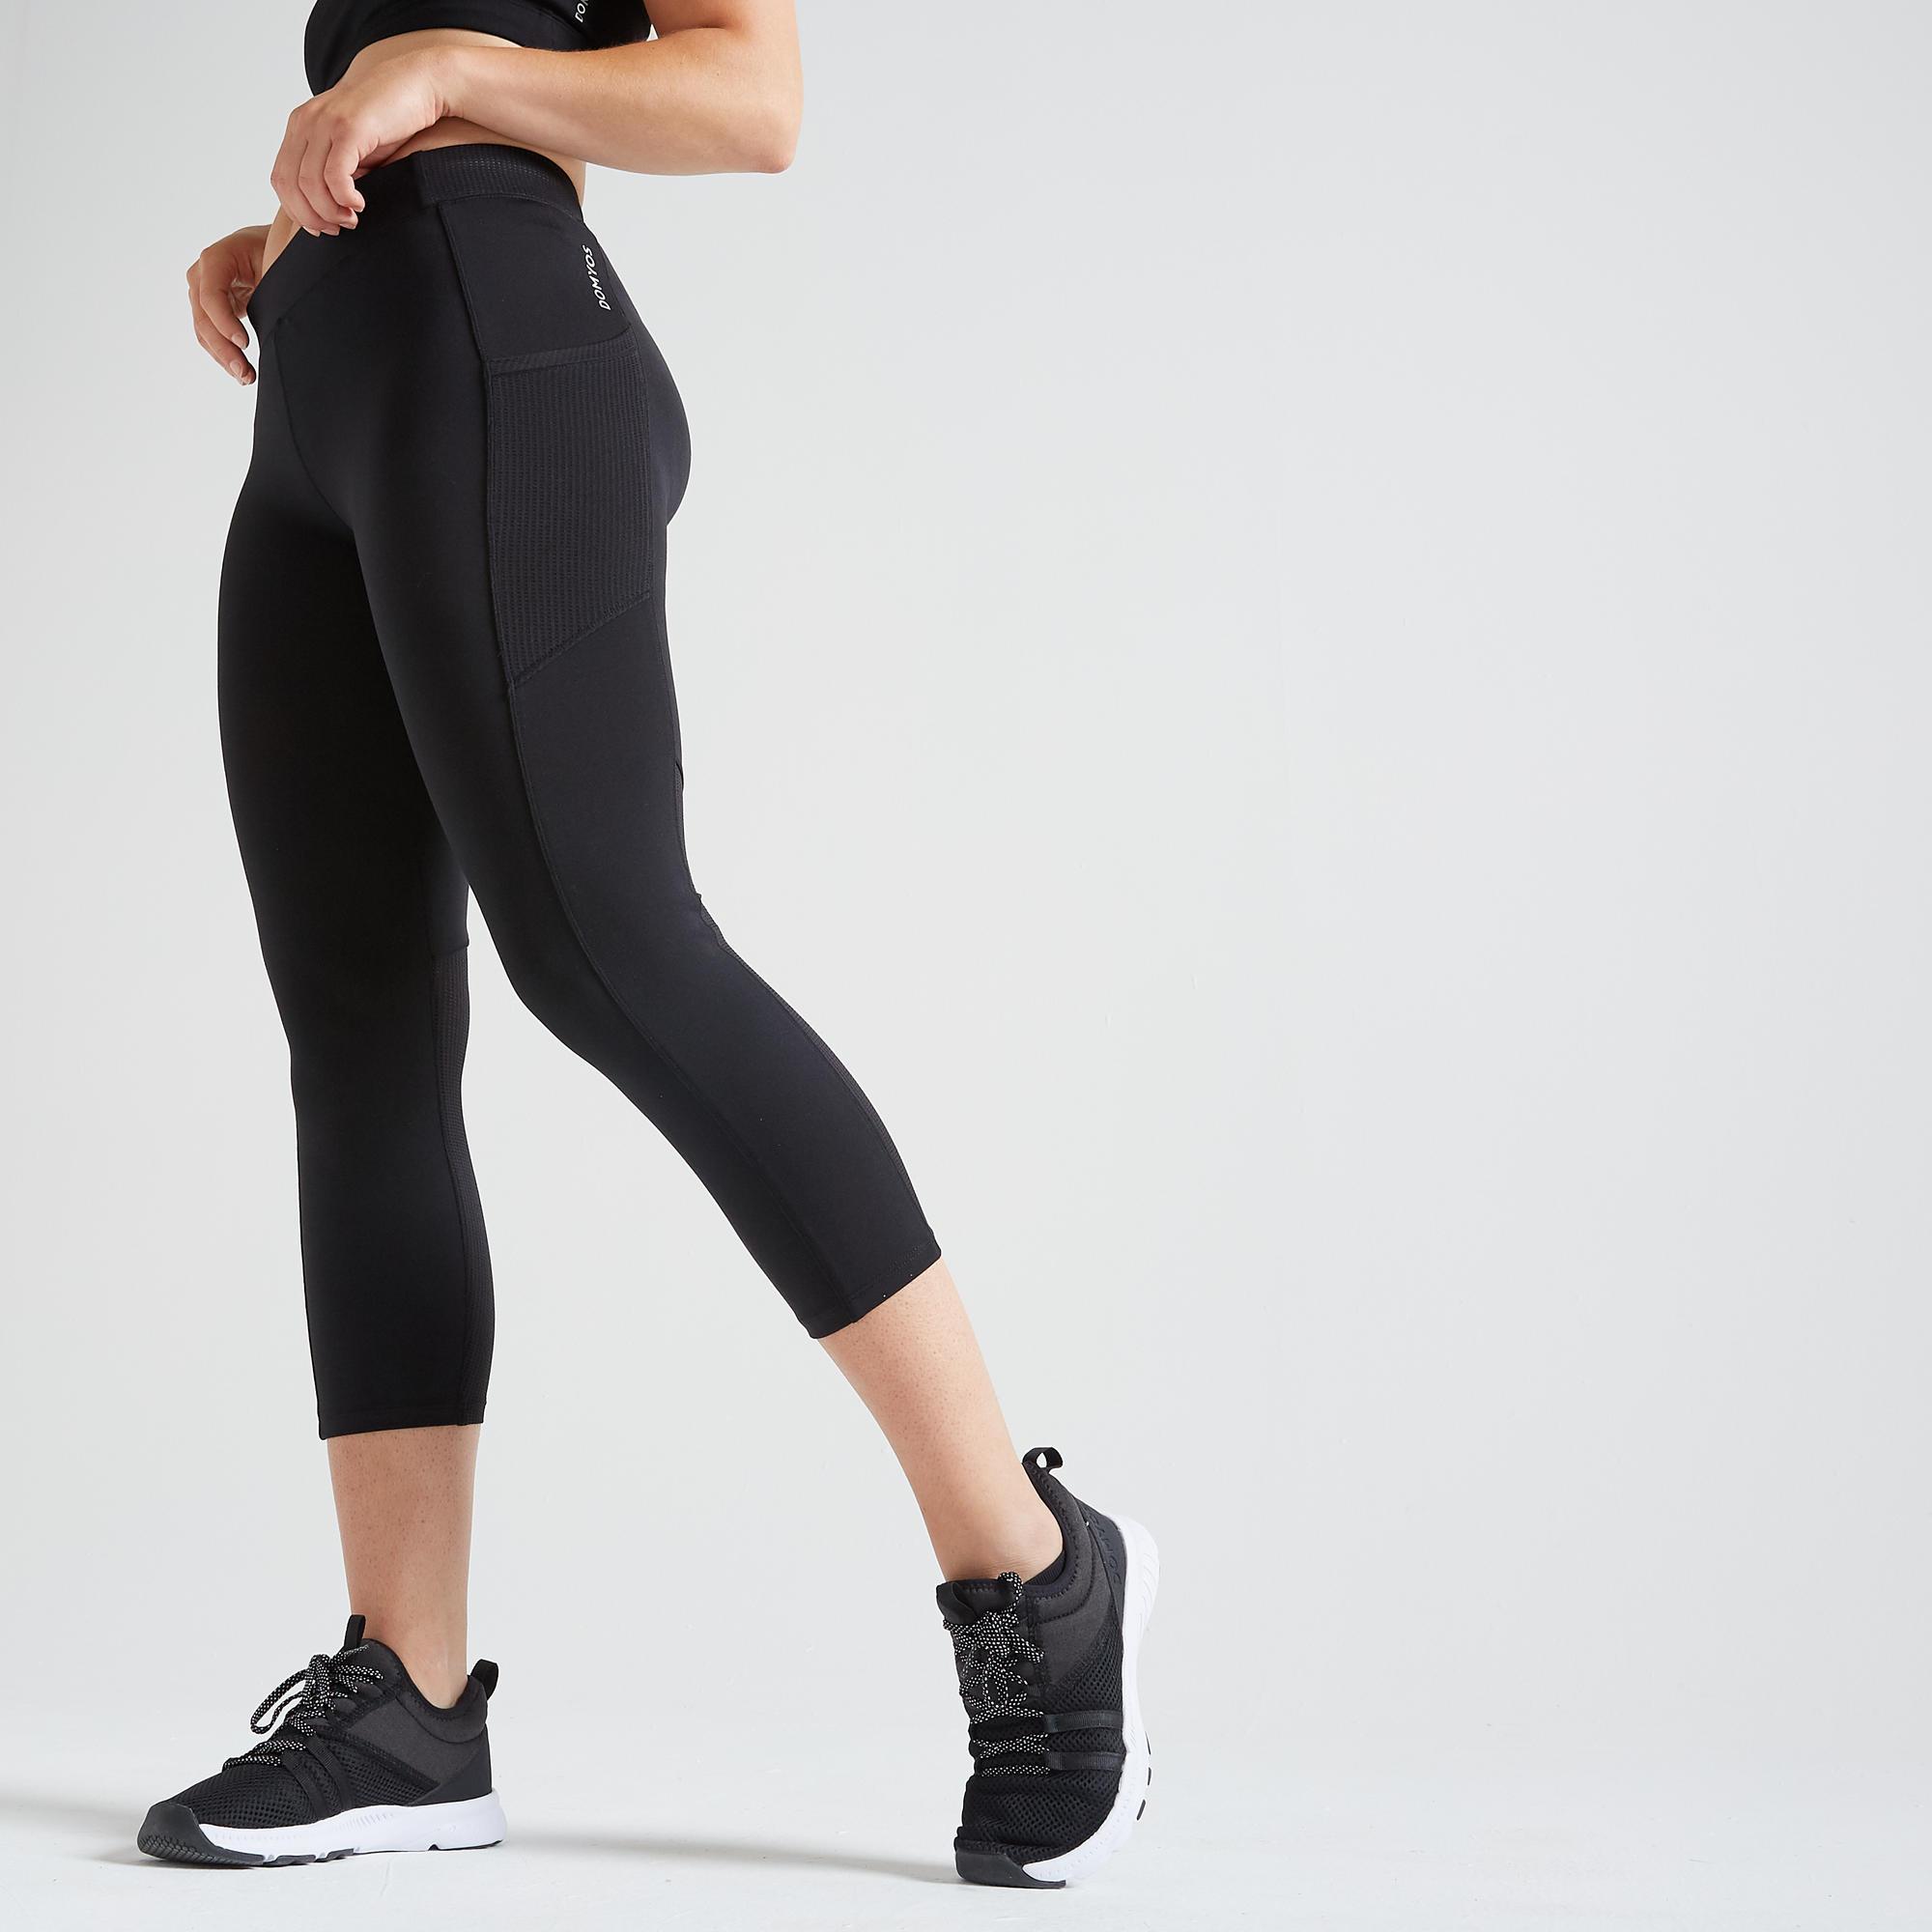 120 Women S Fitness Cardio Training 7 8 Leggings Black Domyos By Decathlon